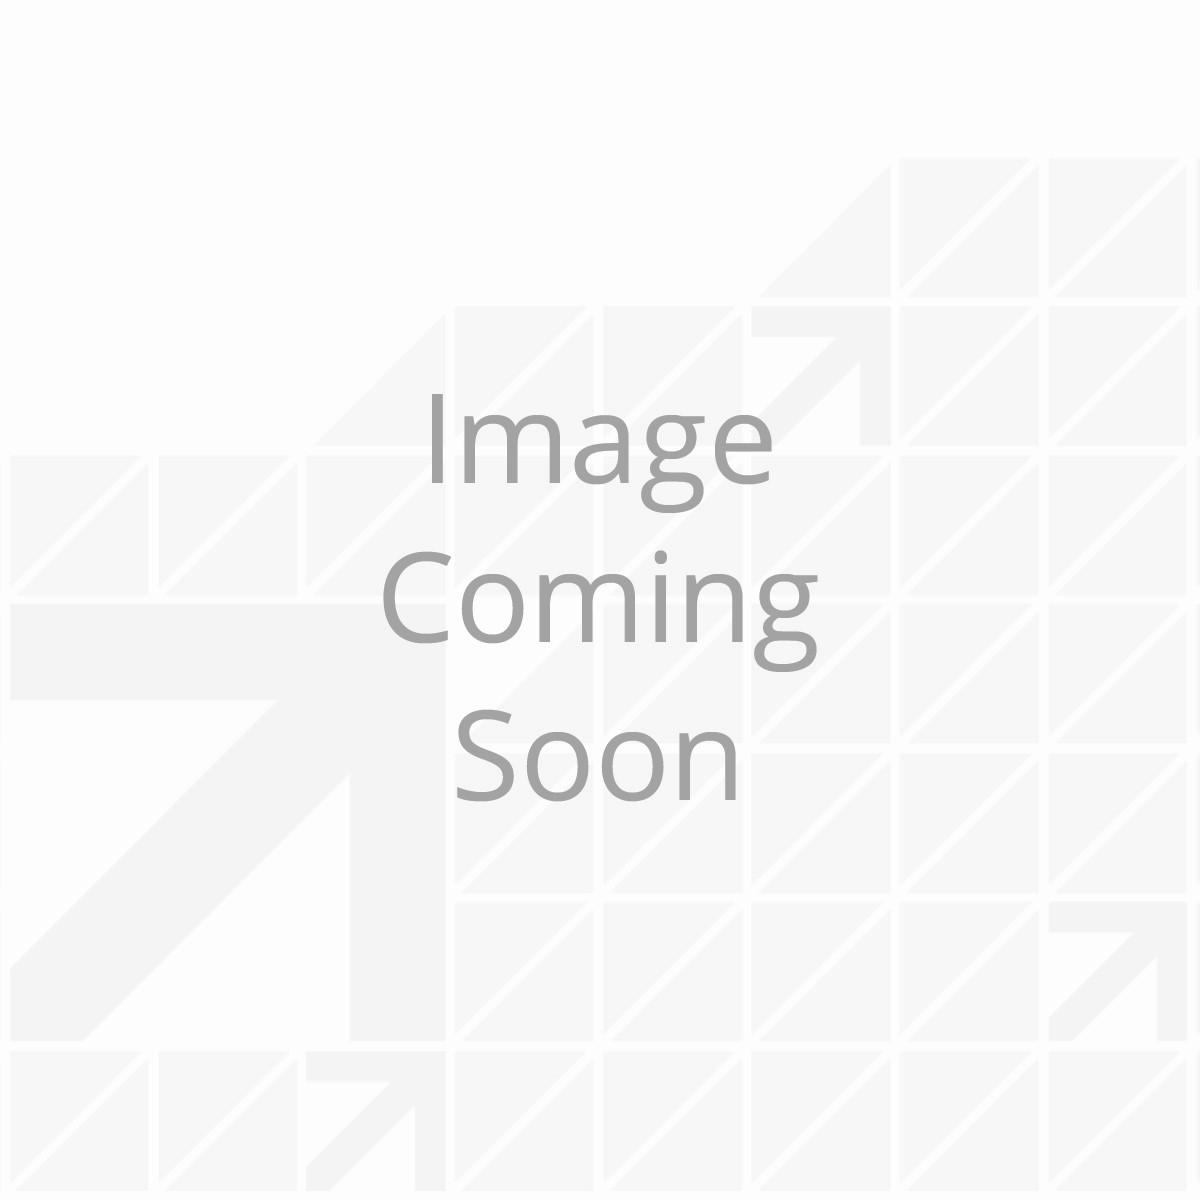 181638_Skid-Tape_001